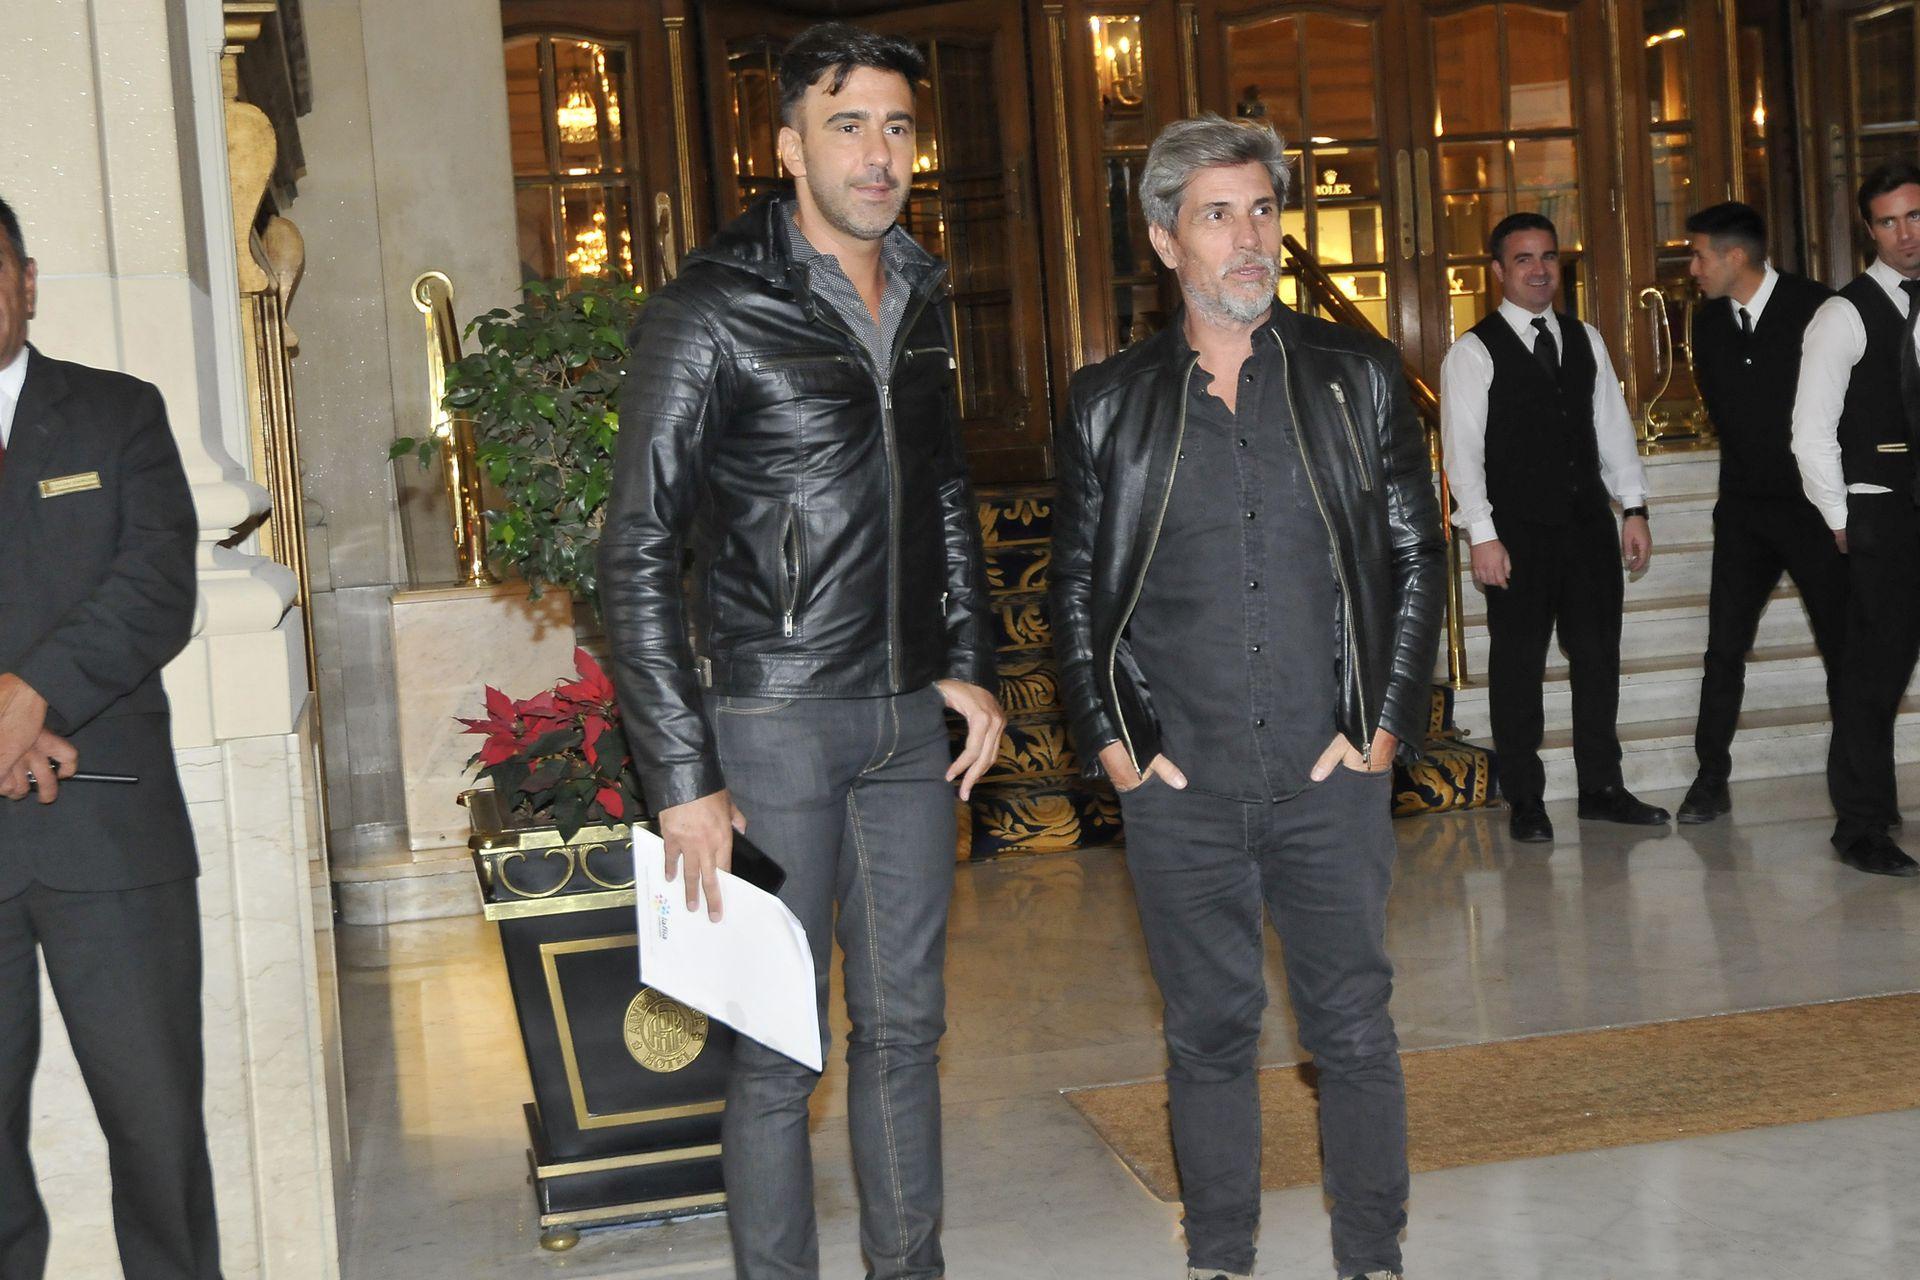 Federico Hoppe y El Chato Prada, históricos productores de ShowMatch